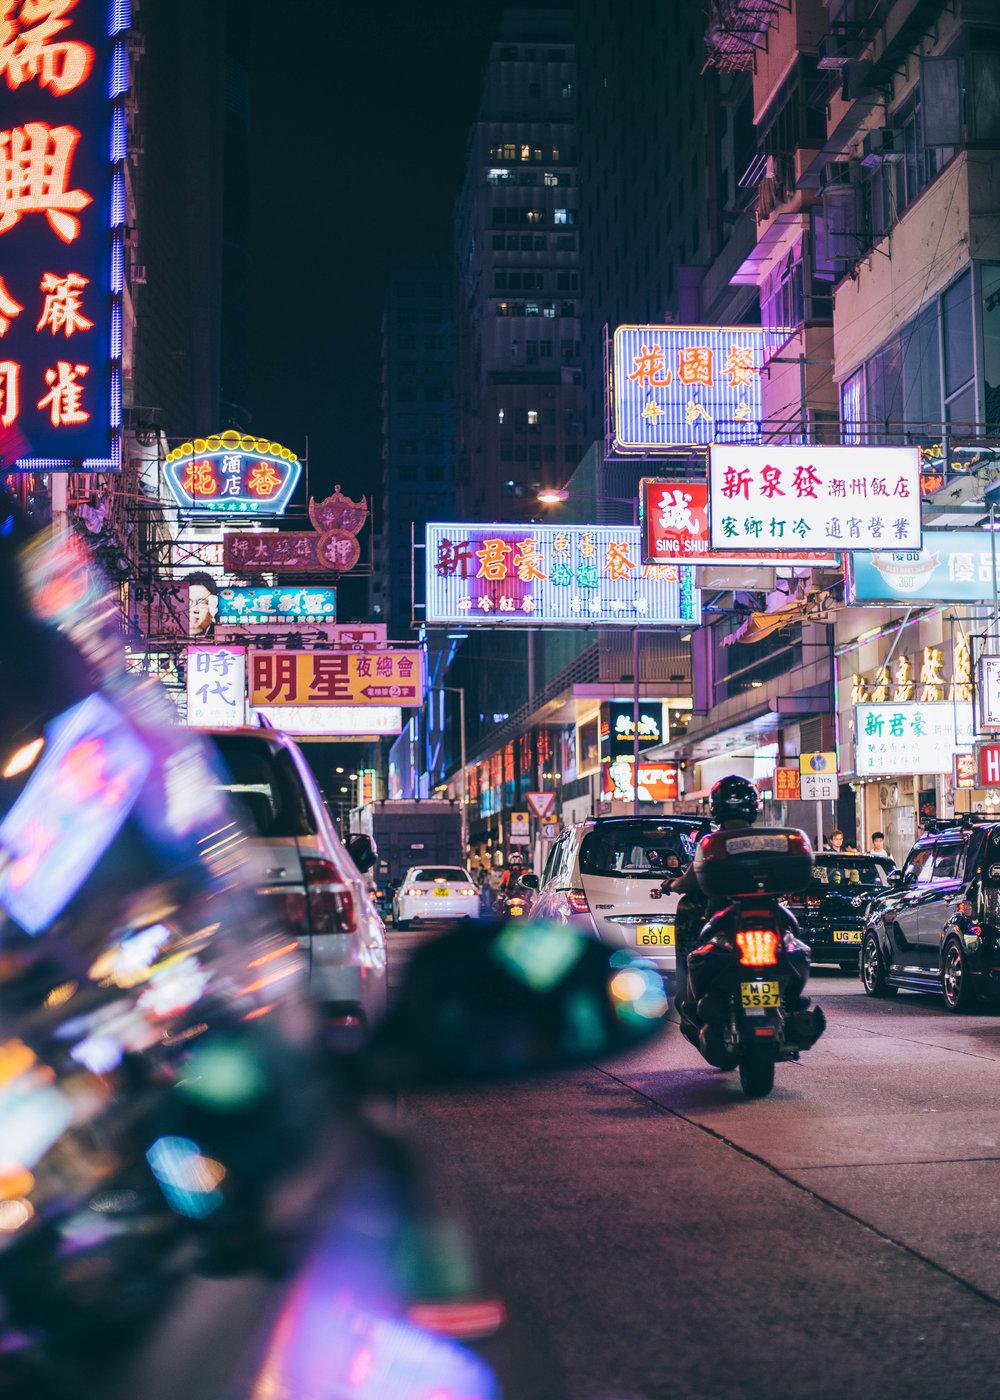 HK_Neon_Twitter-1.jpg